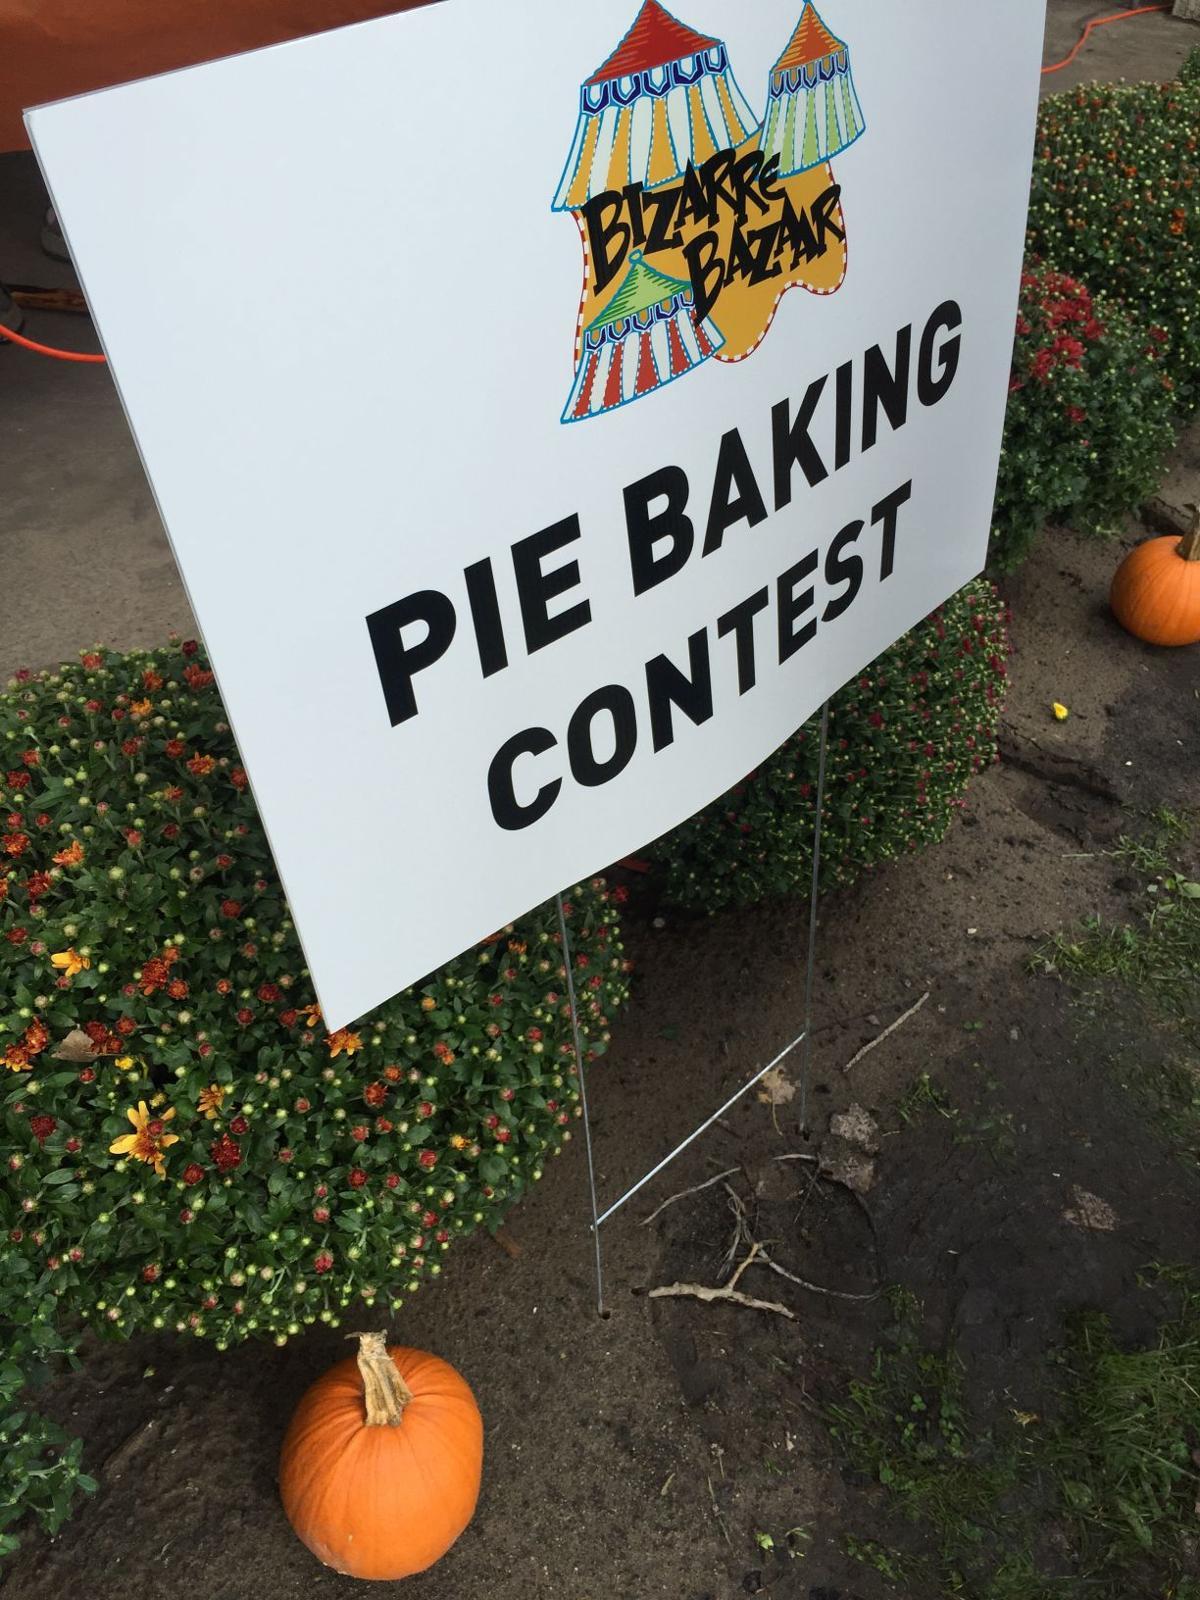 2015 Pie Baking Contest at Bizarre Bazaar in Hammond